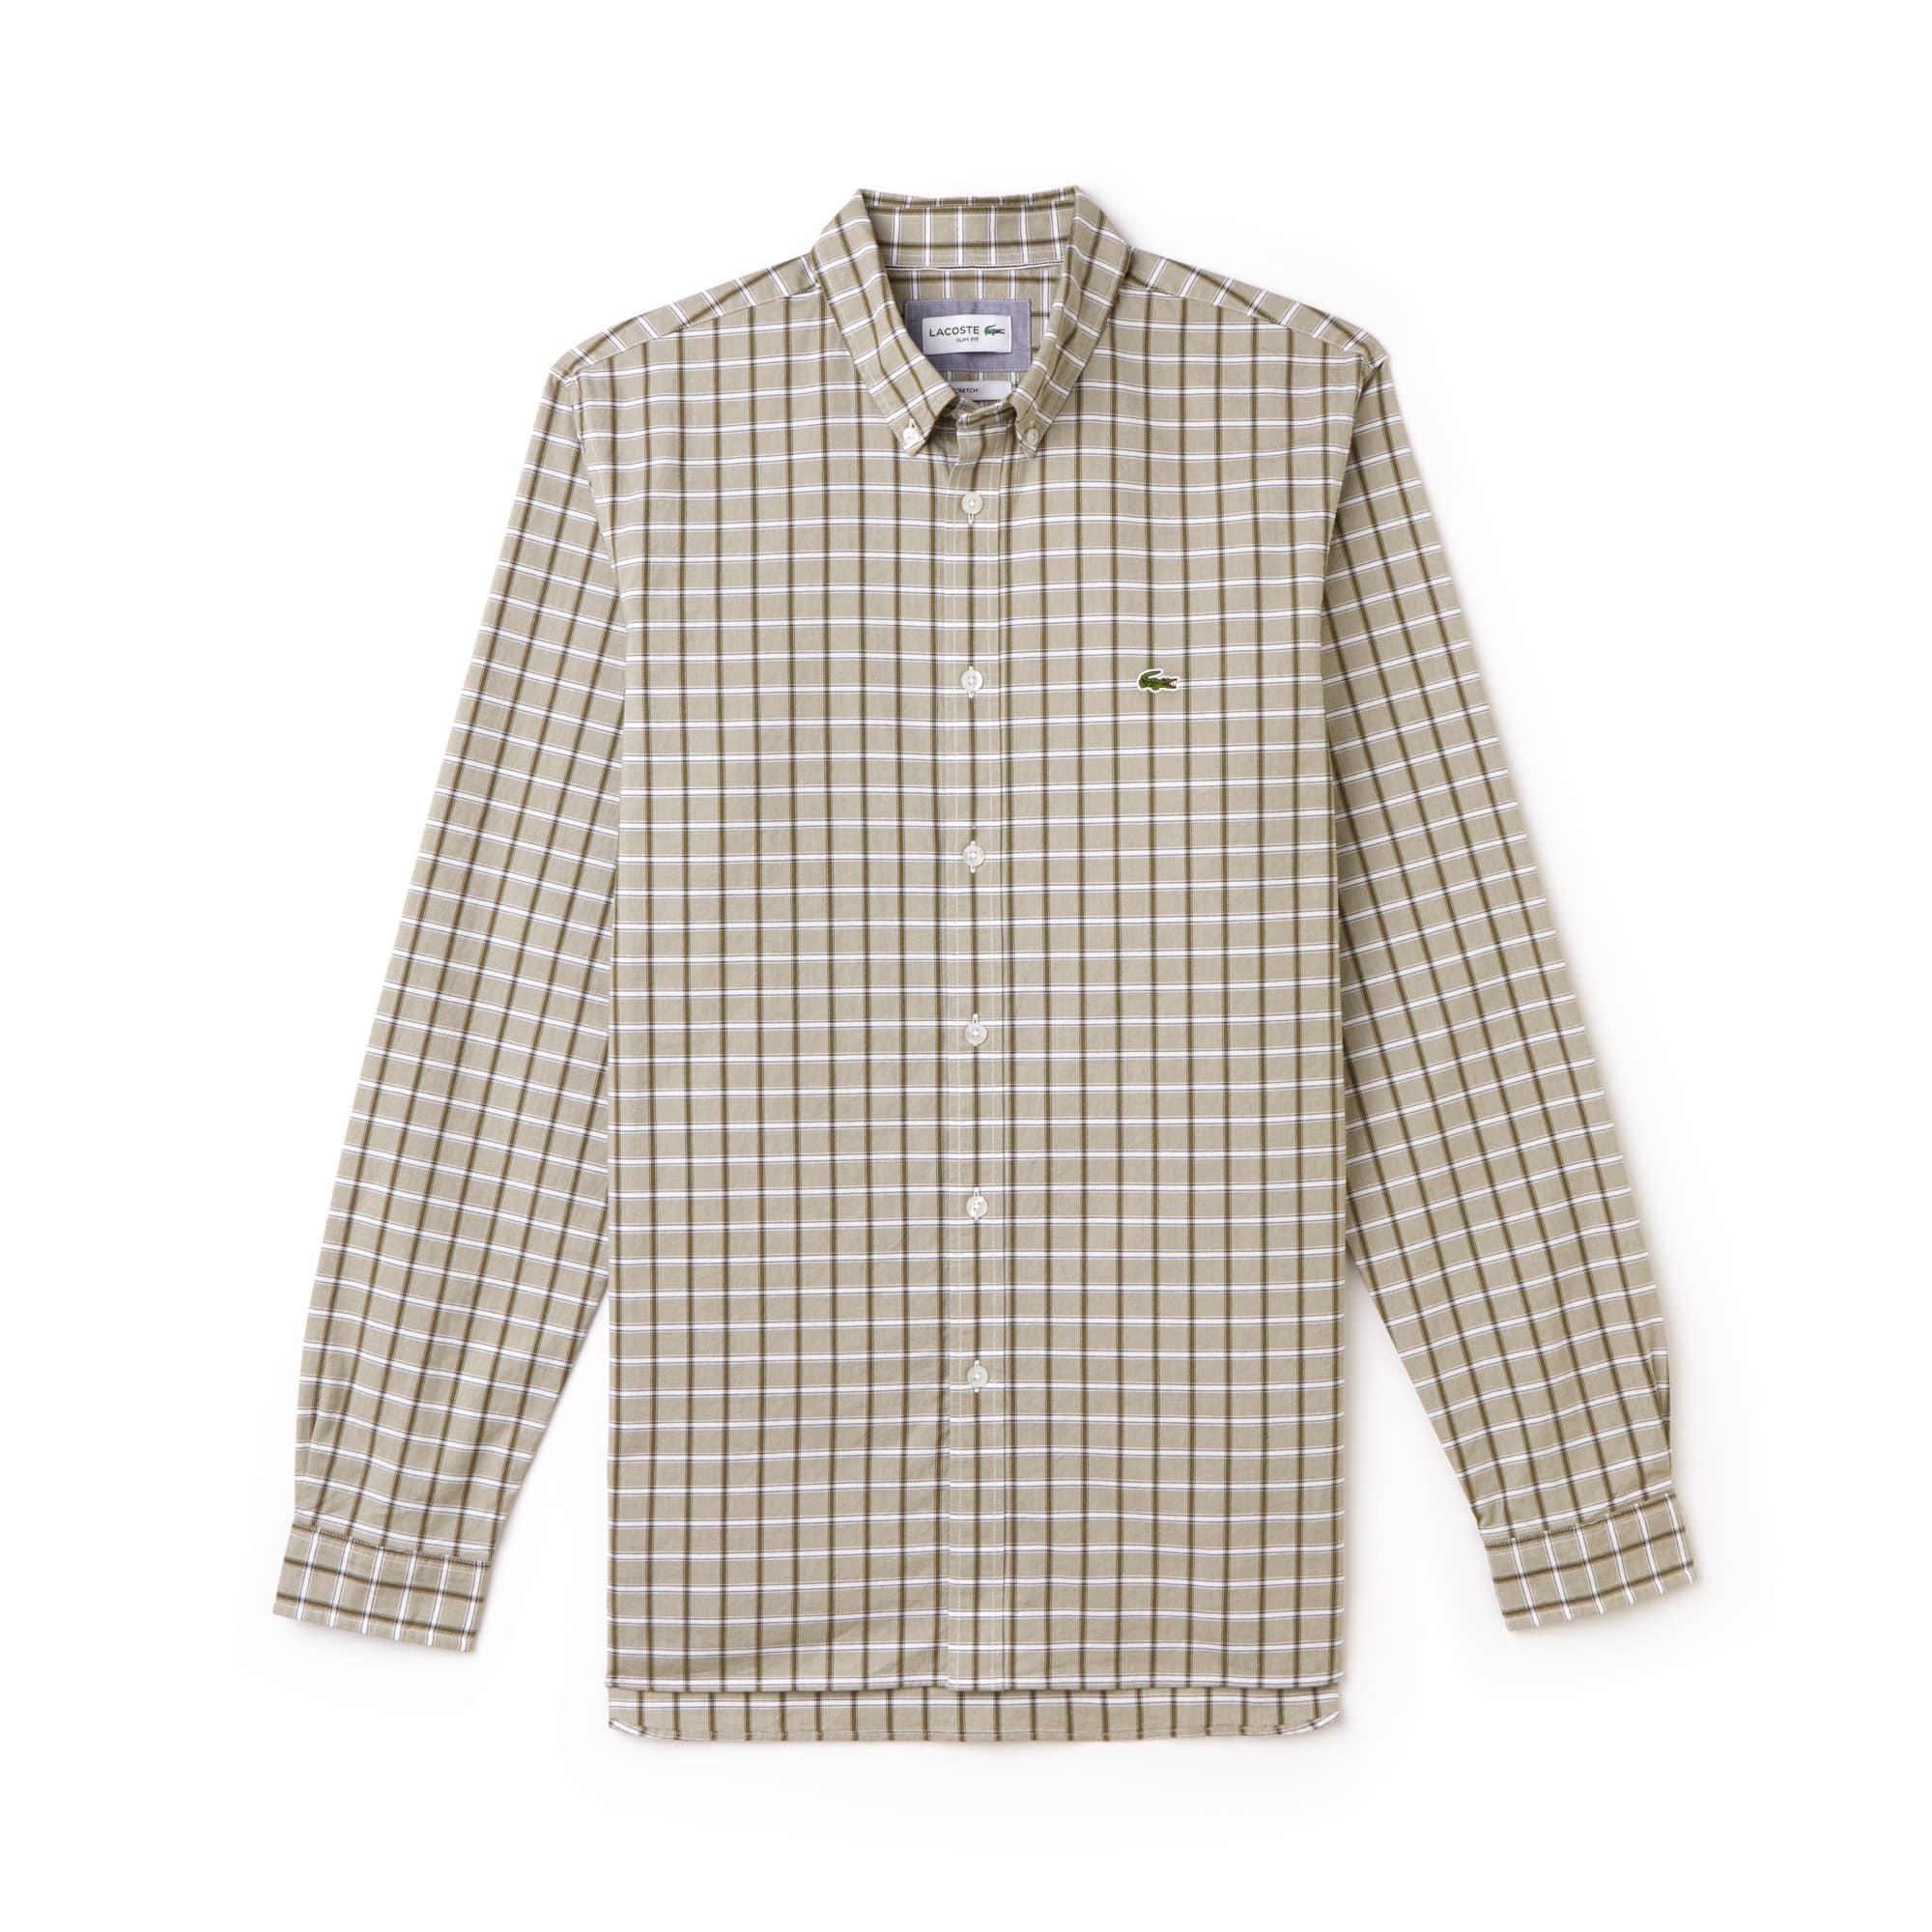 Men's Slim Fit Check Stretch Oxford Shirt